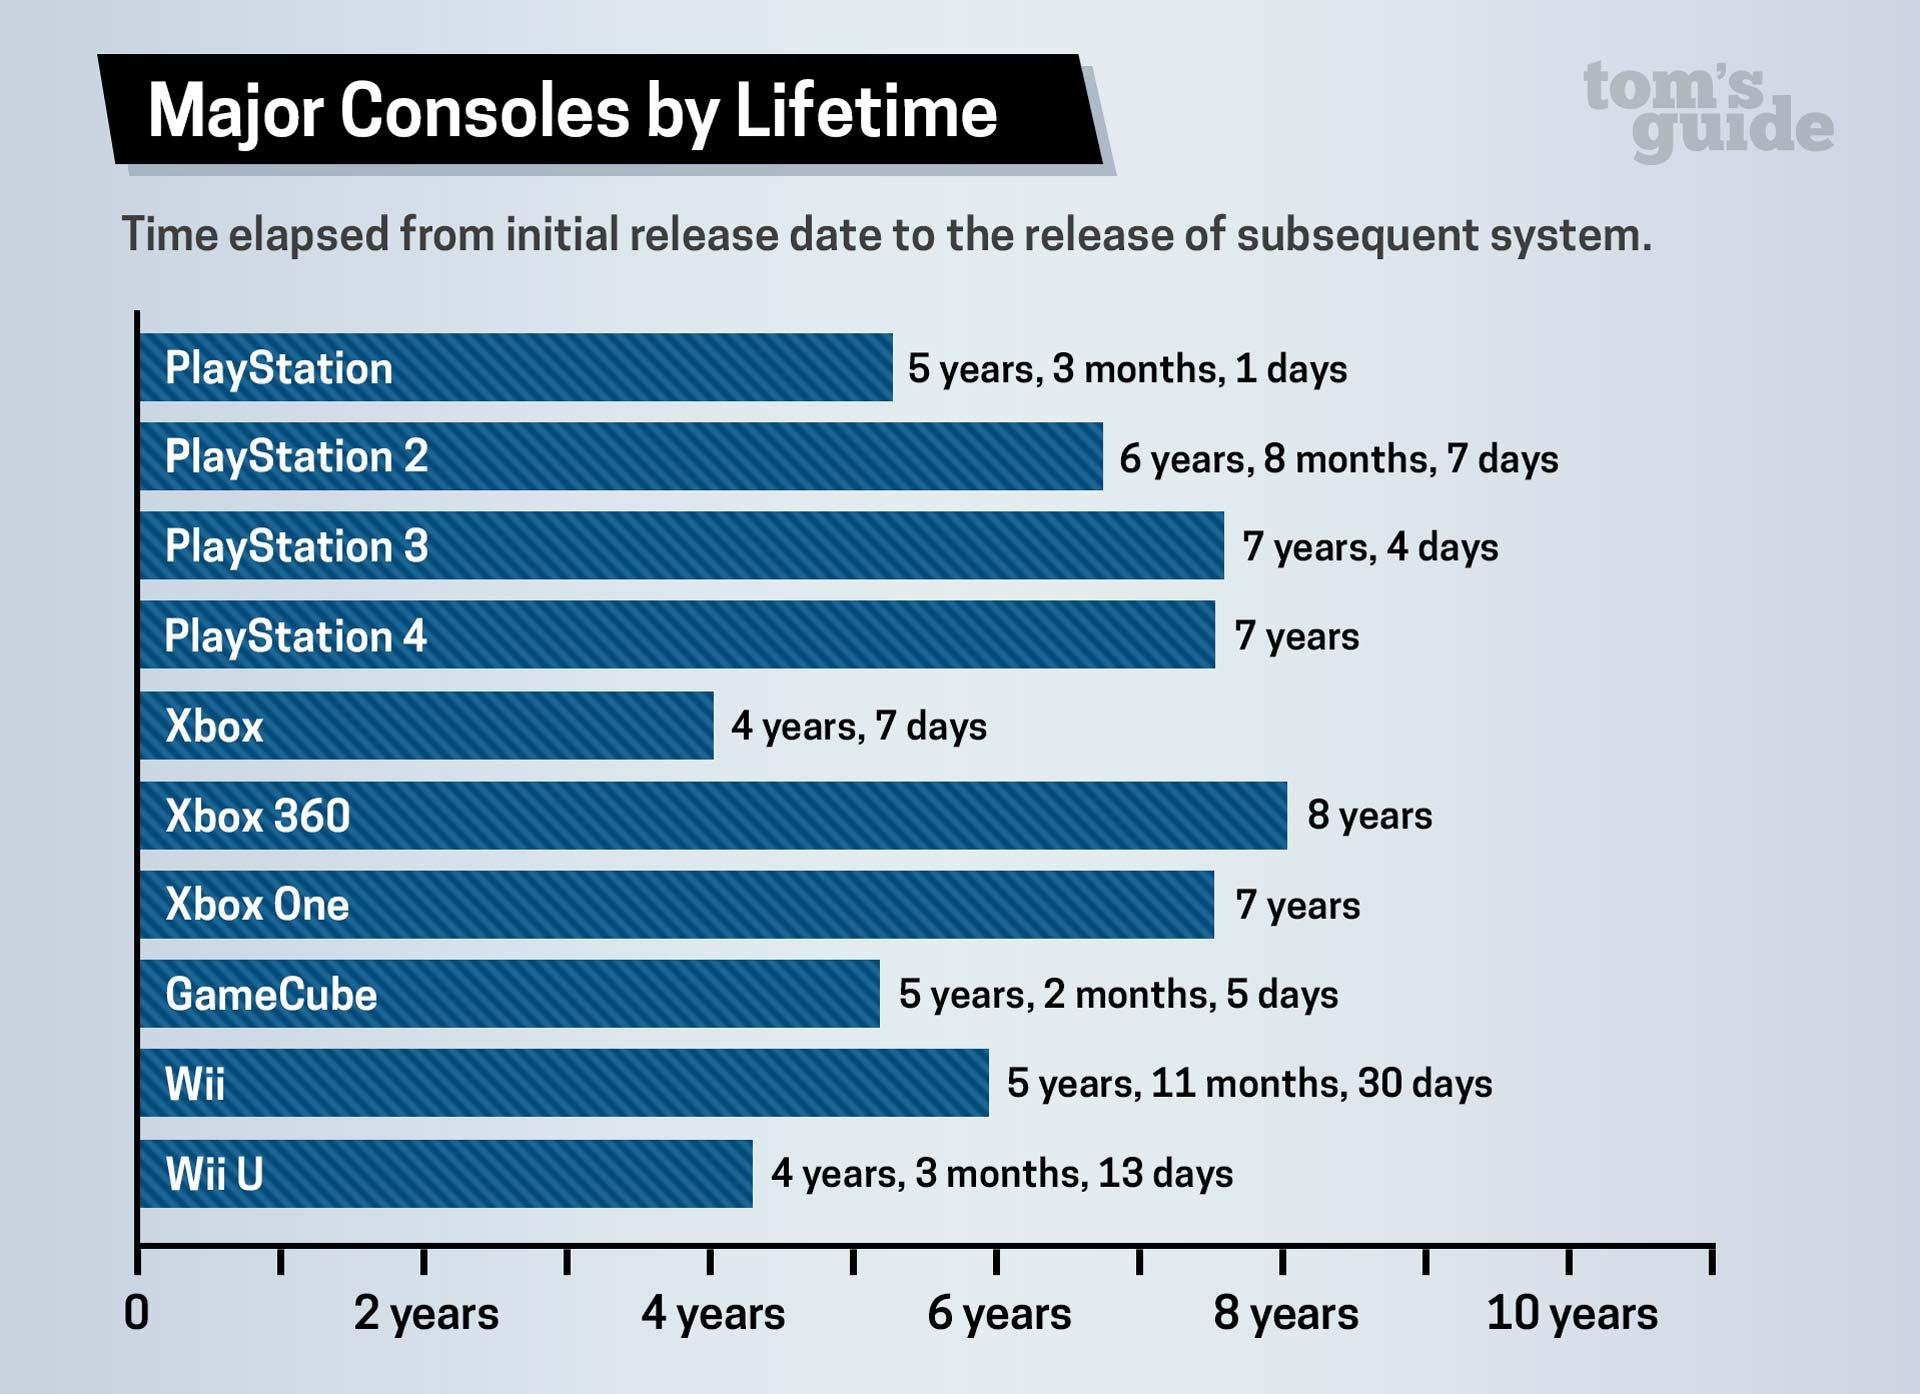 20 ans de cycles de vie de la console